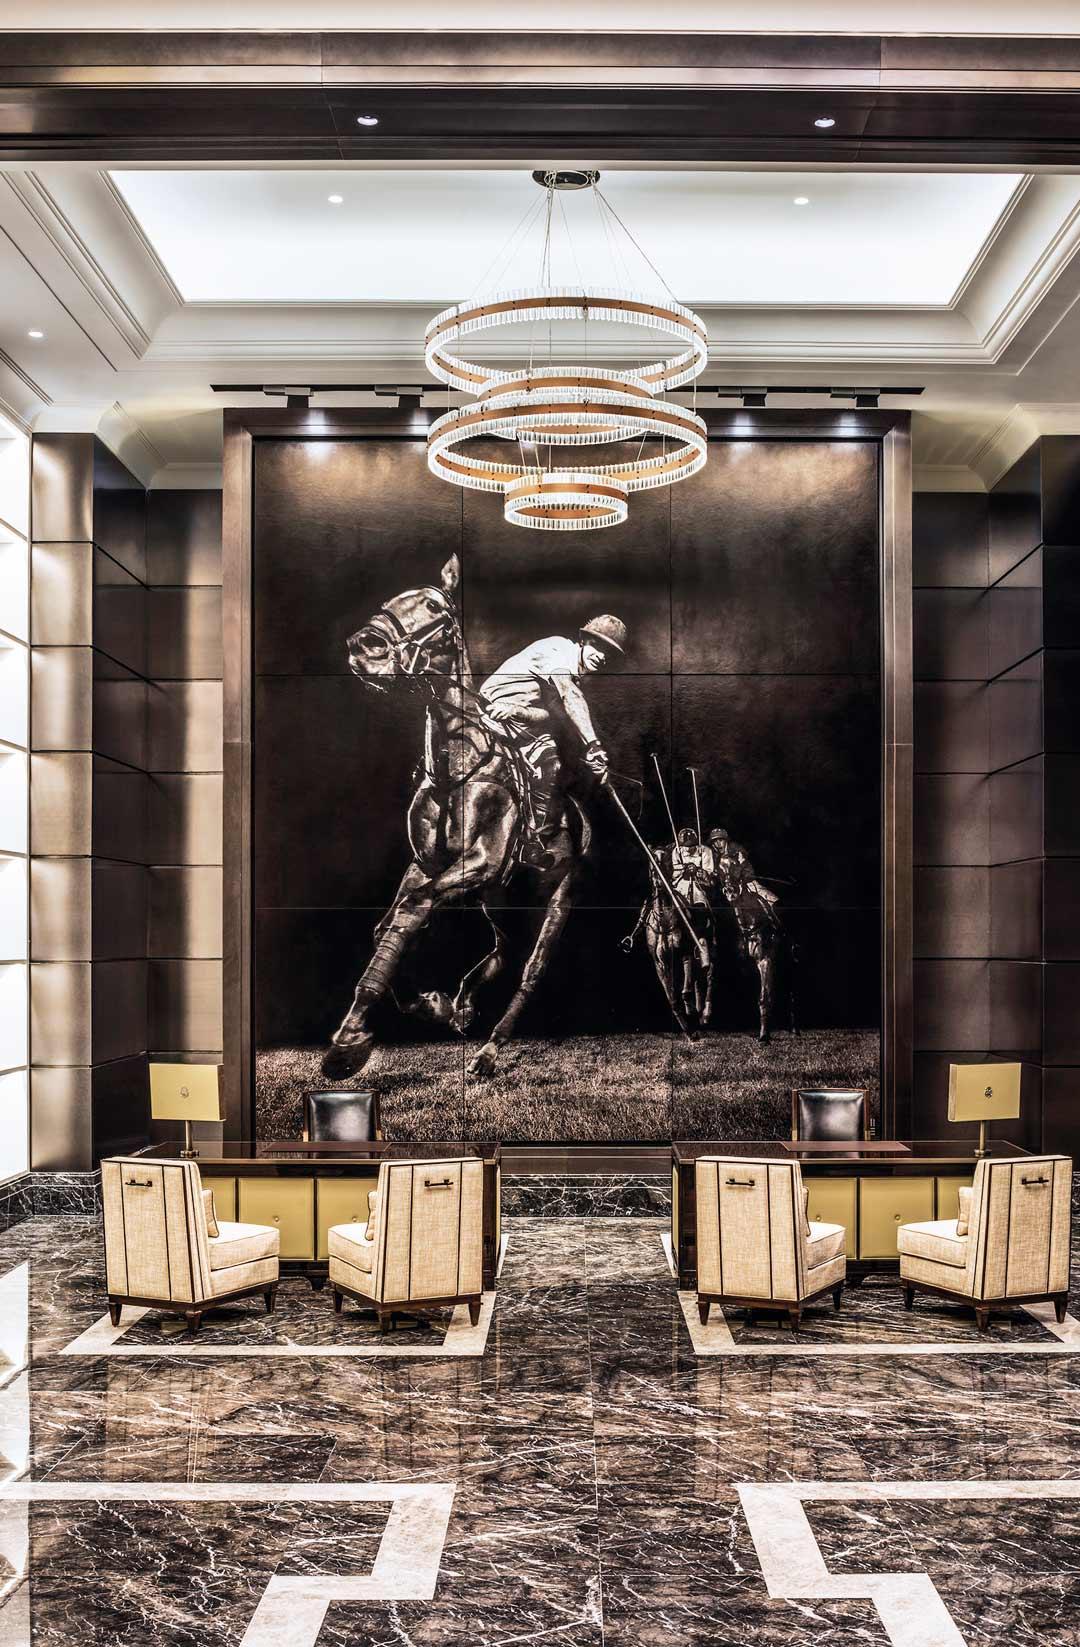 A polo scene dominates the lobby of the St. Regis Kuala Lumpur.